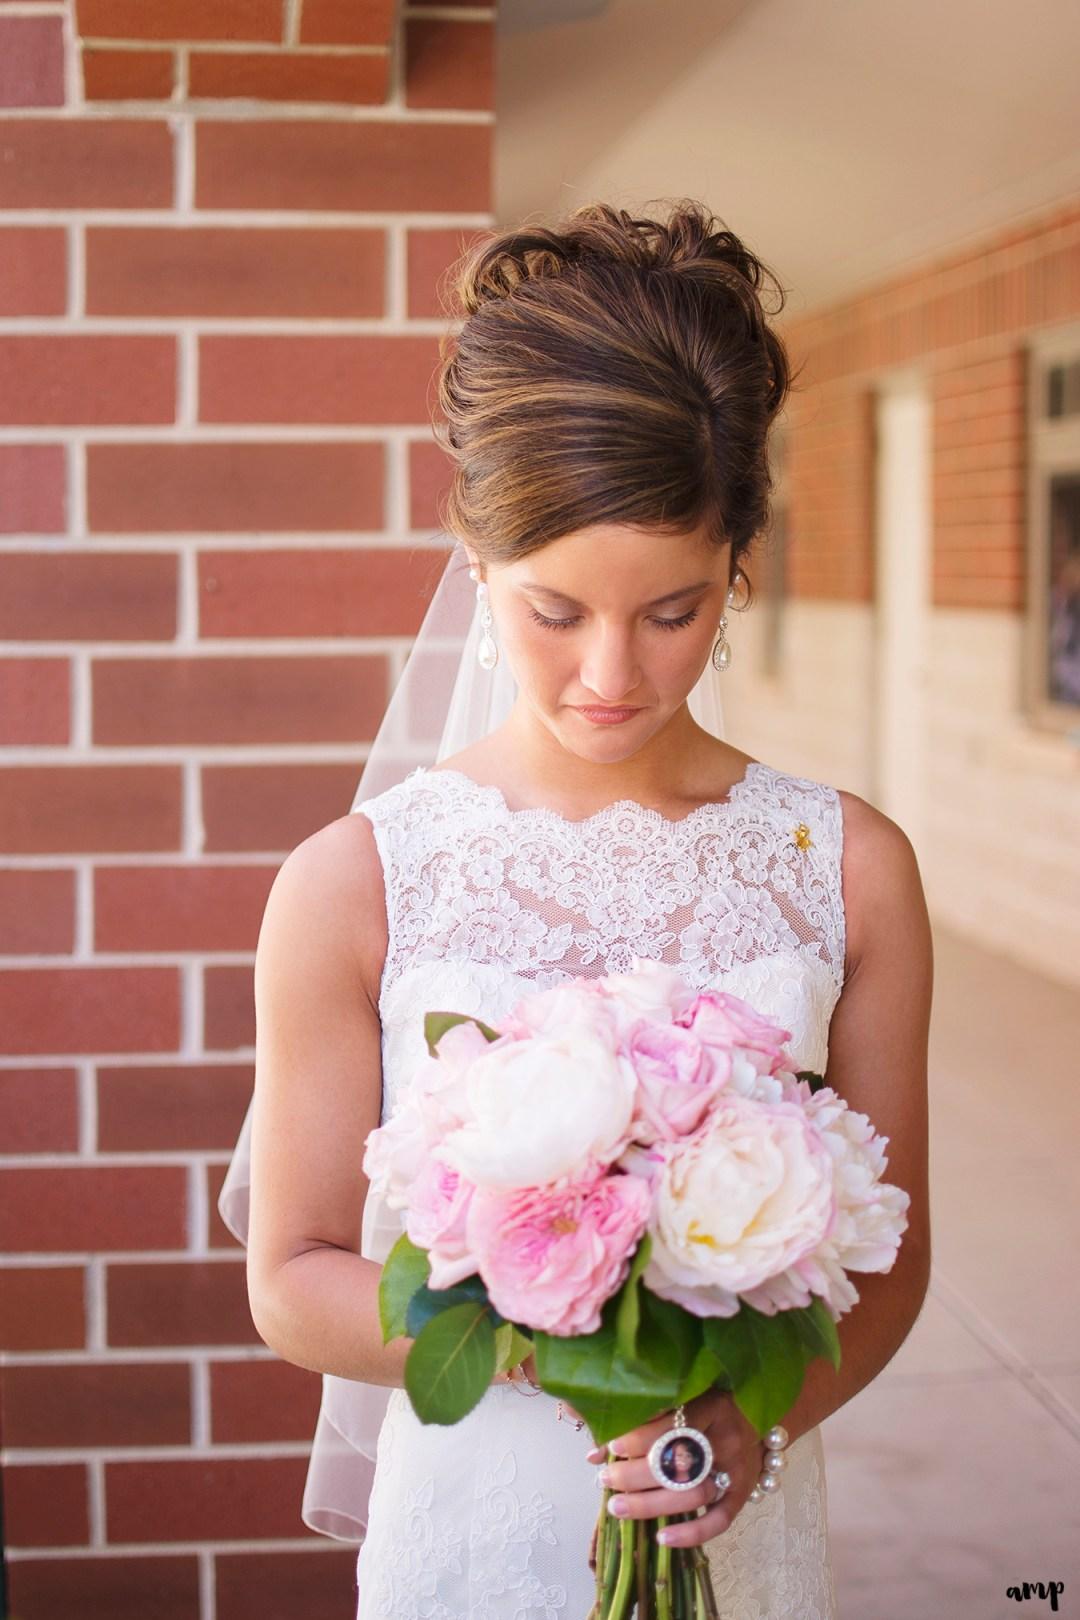 Bride with her pink wedding bouquet